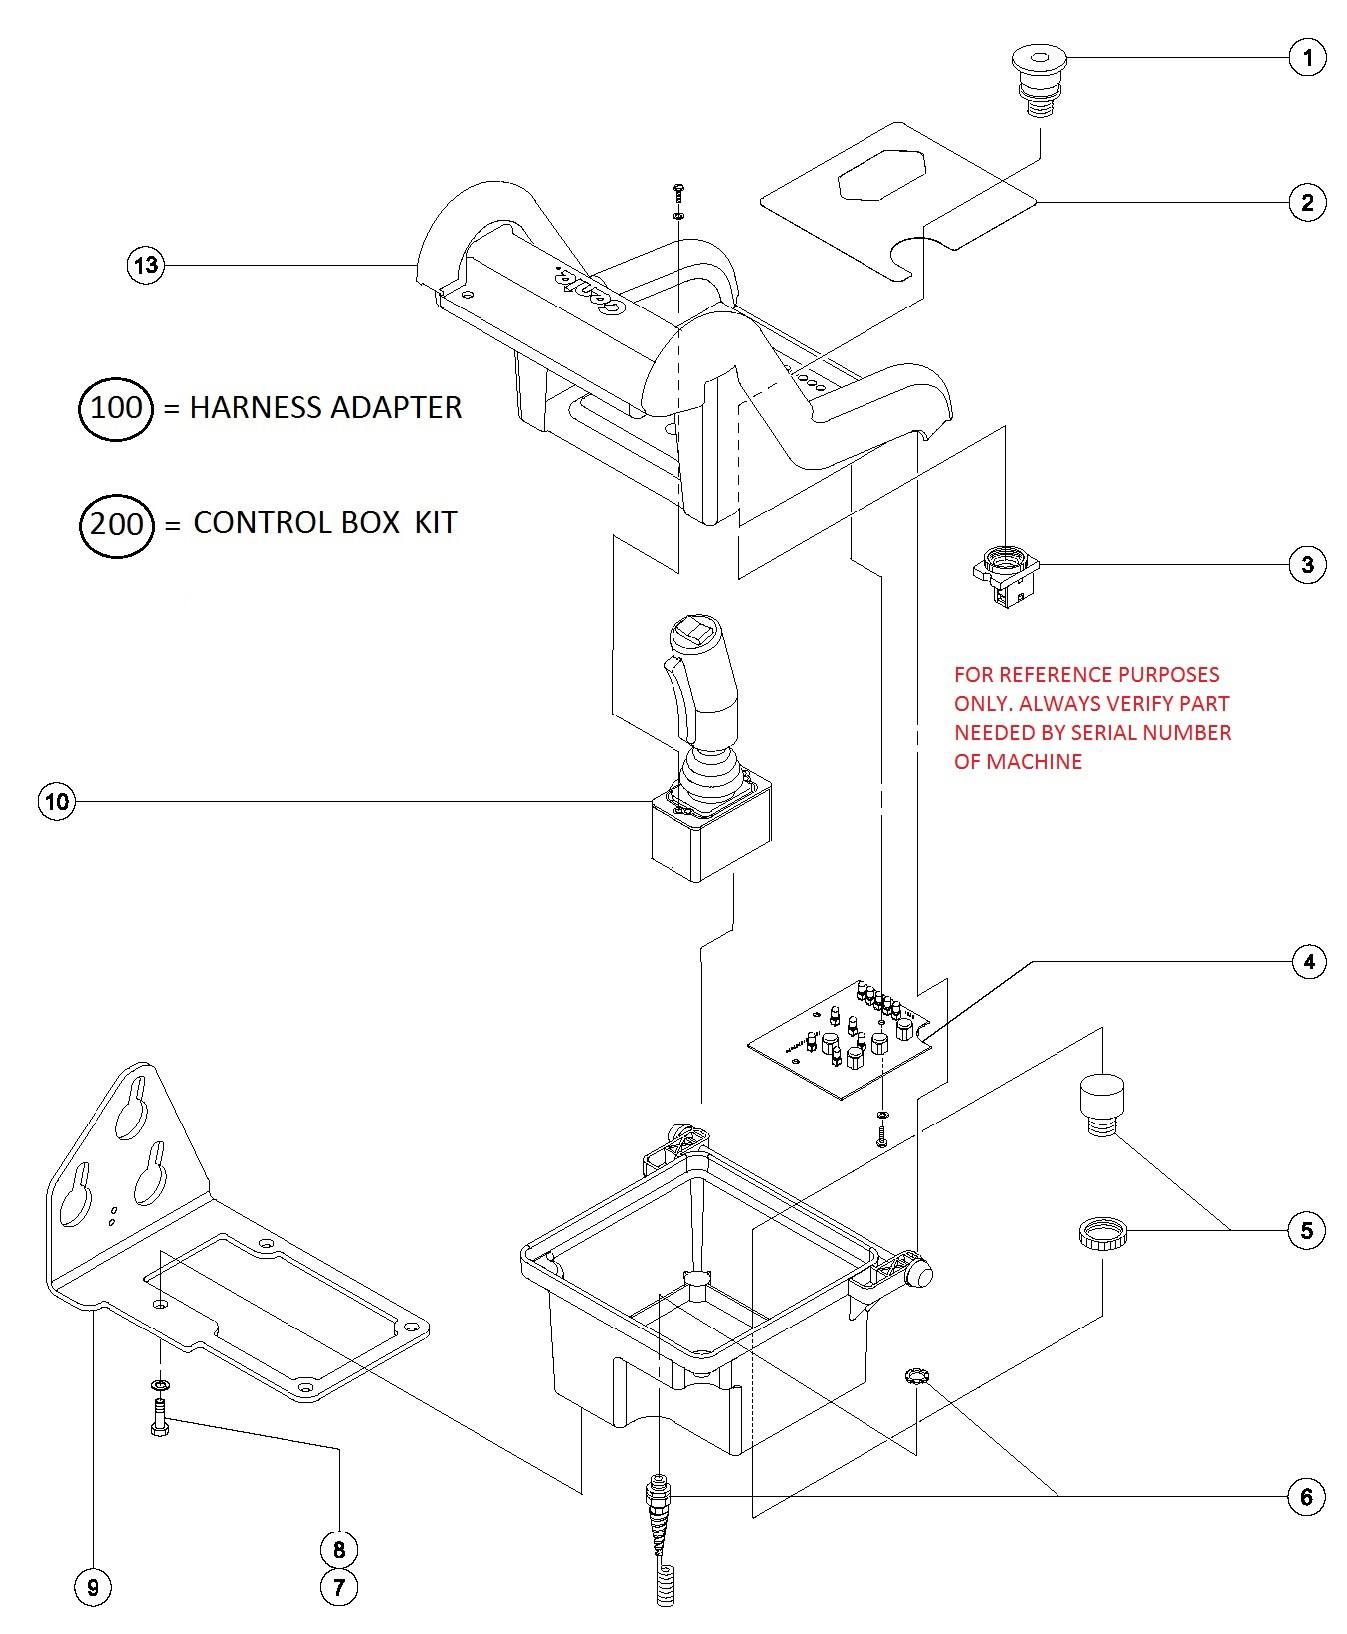 wiring diagram for jlg scissor lift 1532